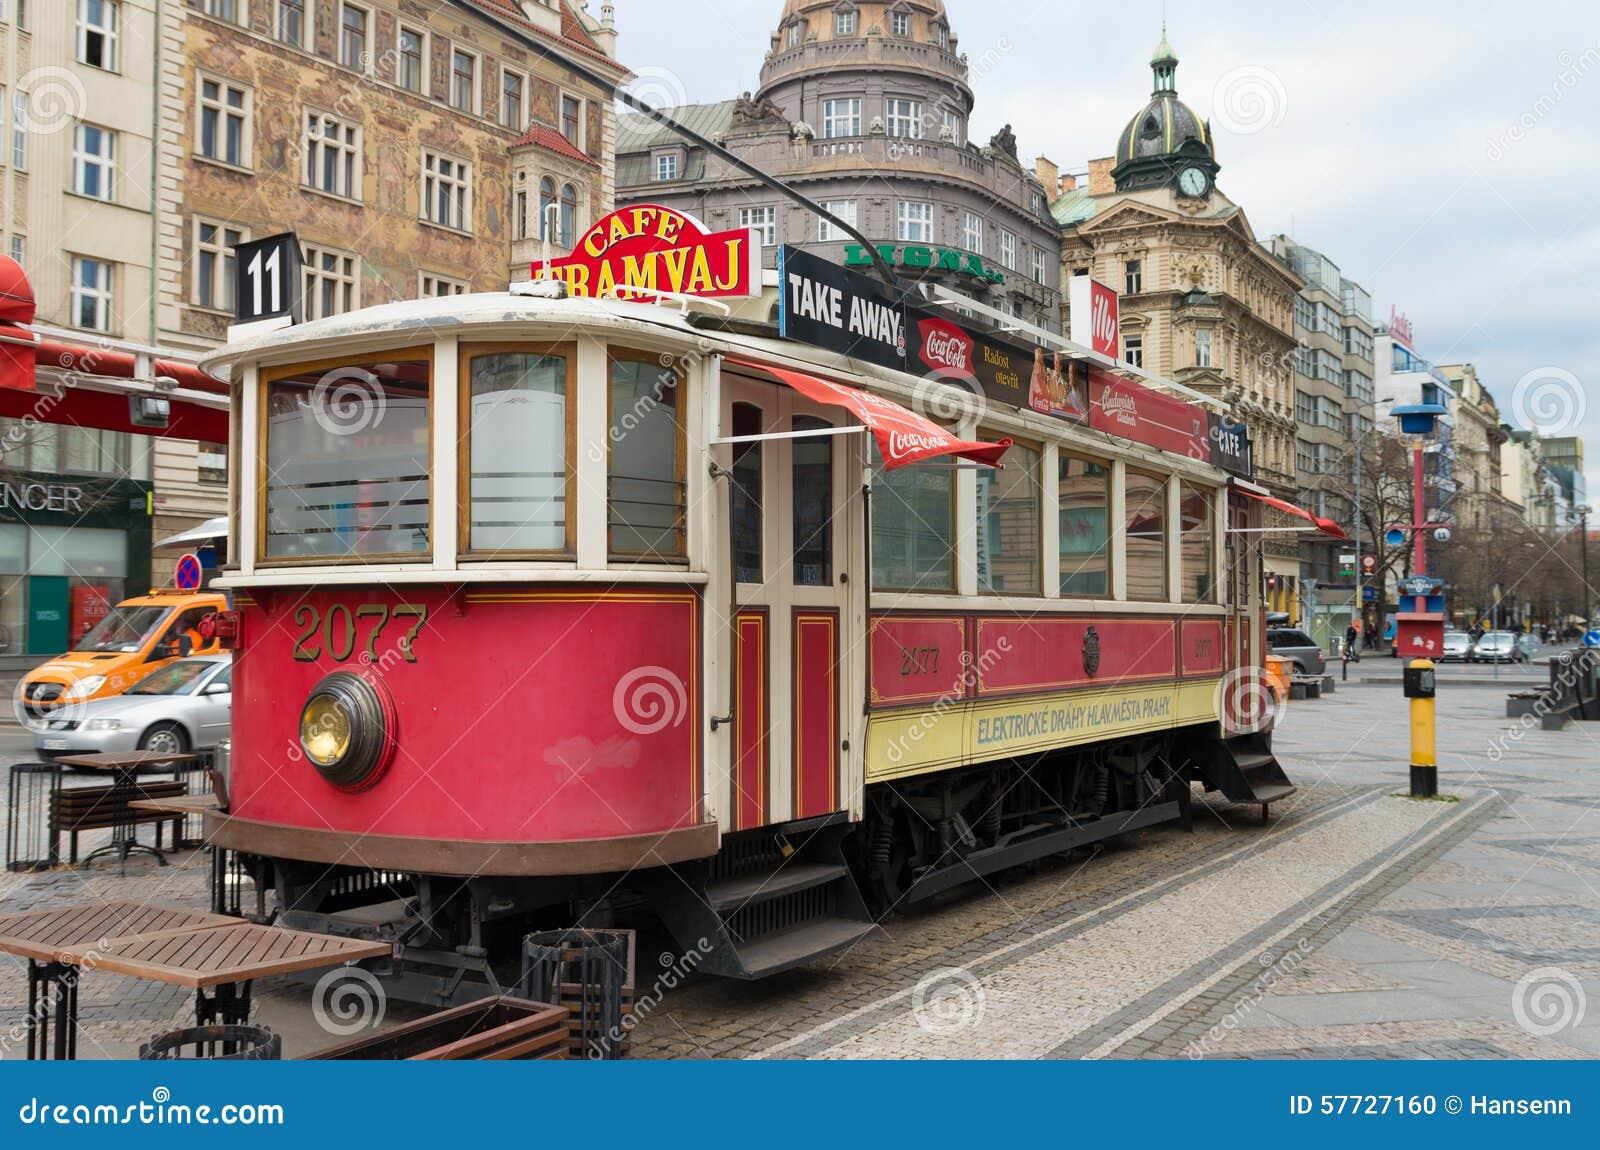 old tram prague street - photo #16